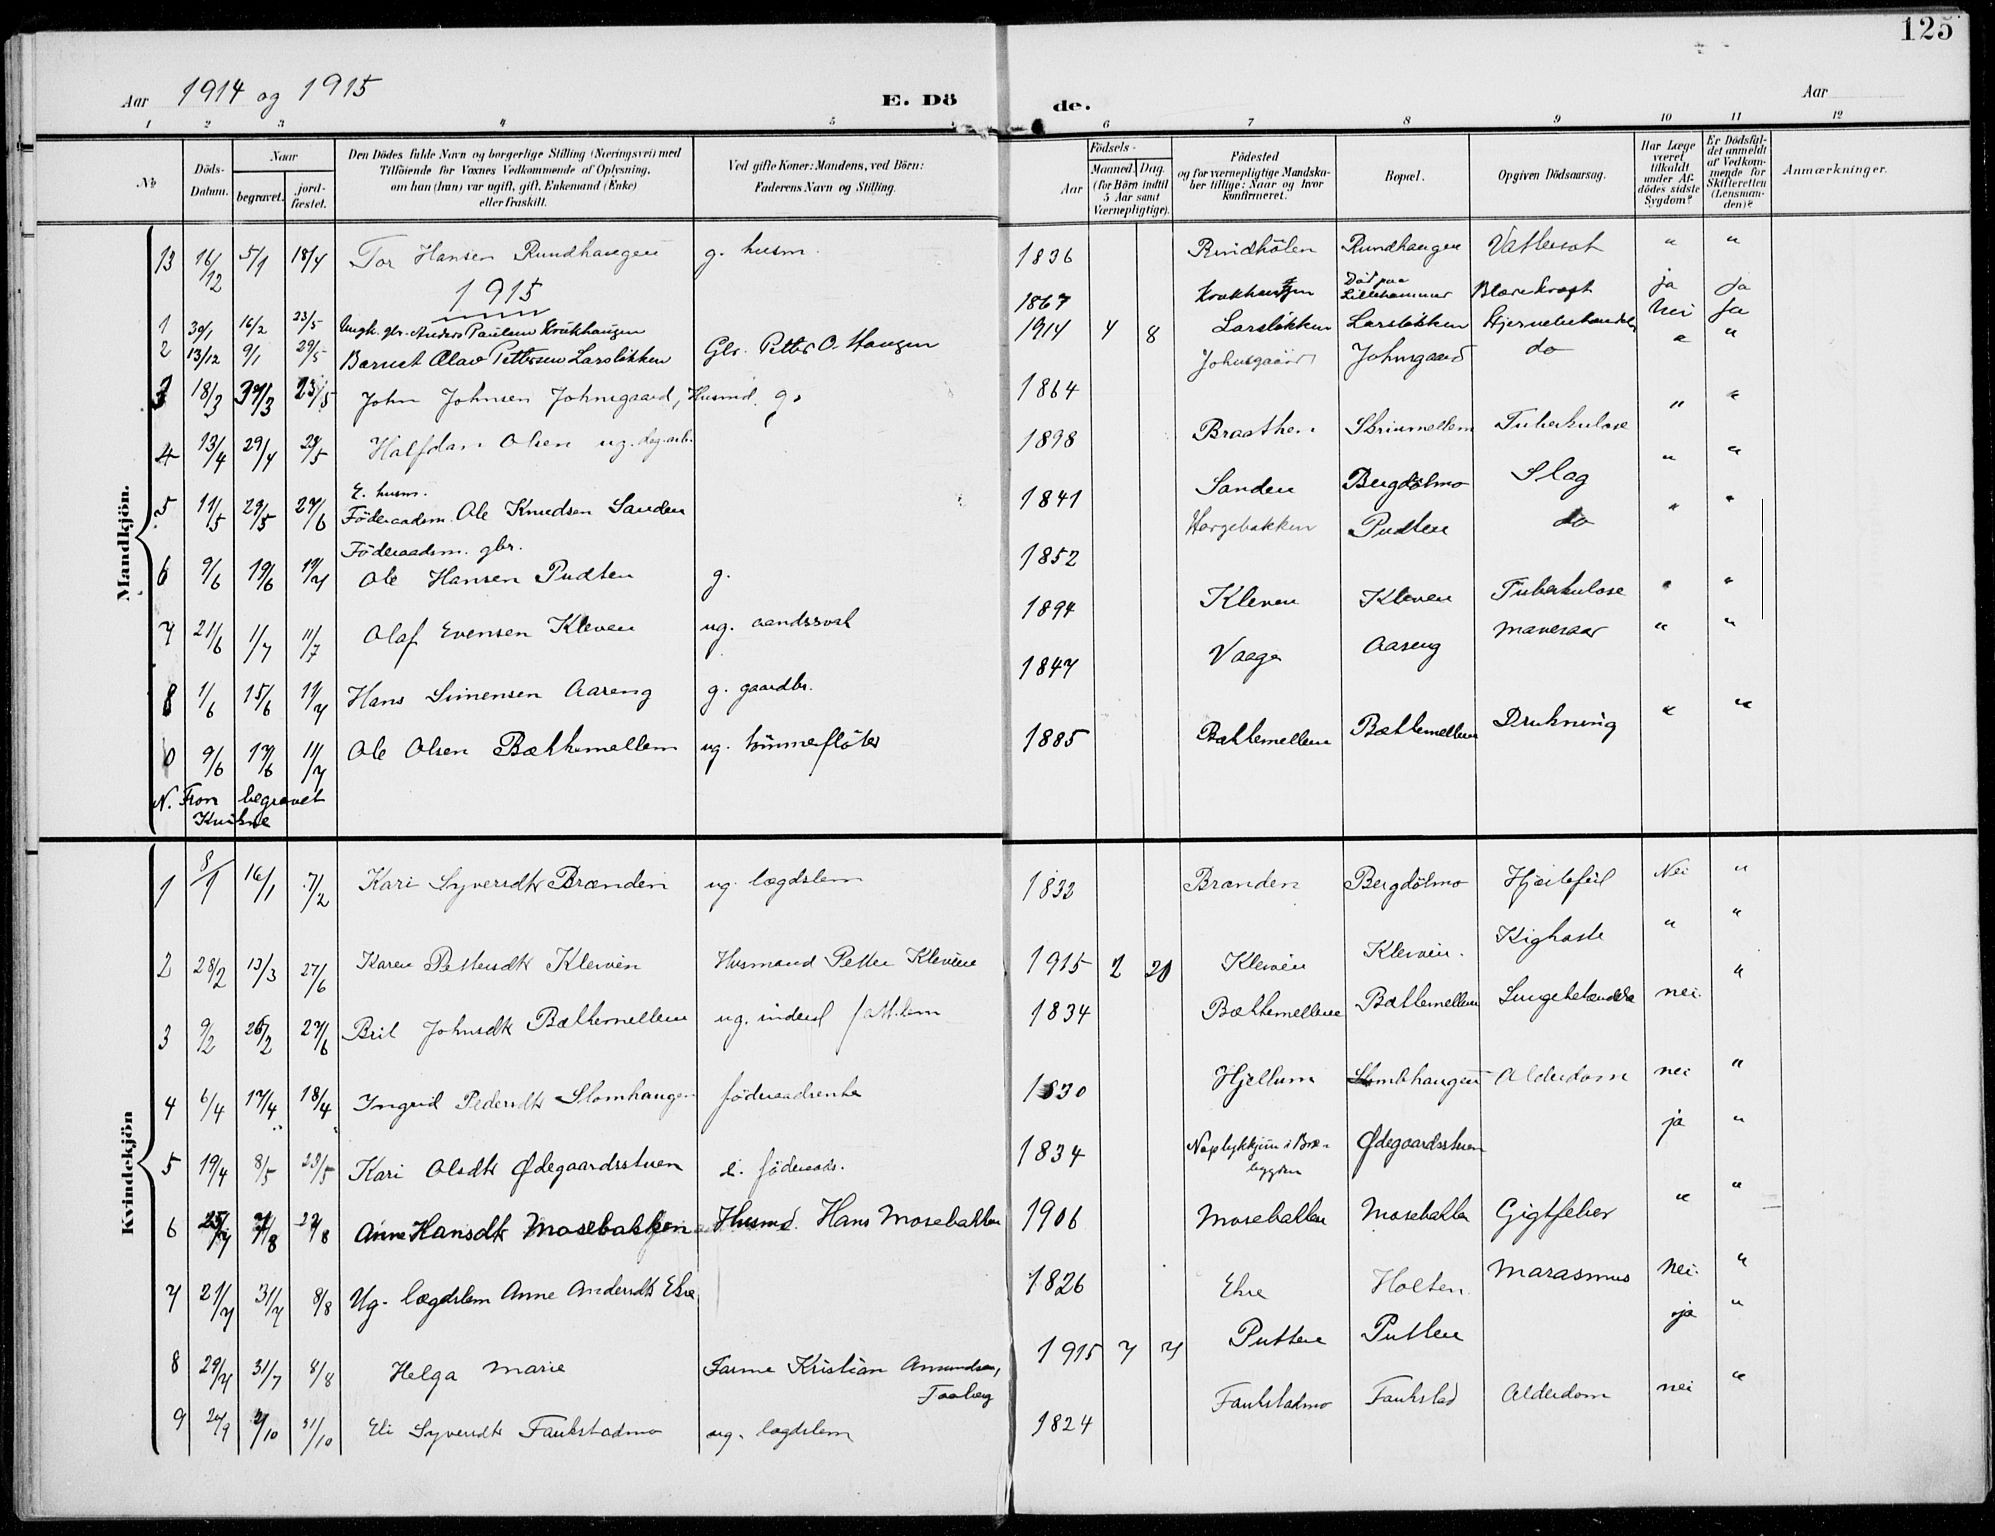 SAH, Sel prestekontor, Parish register (official) no. 1, 1905-1922, p. 125